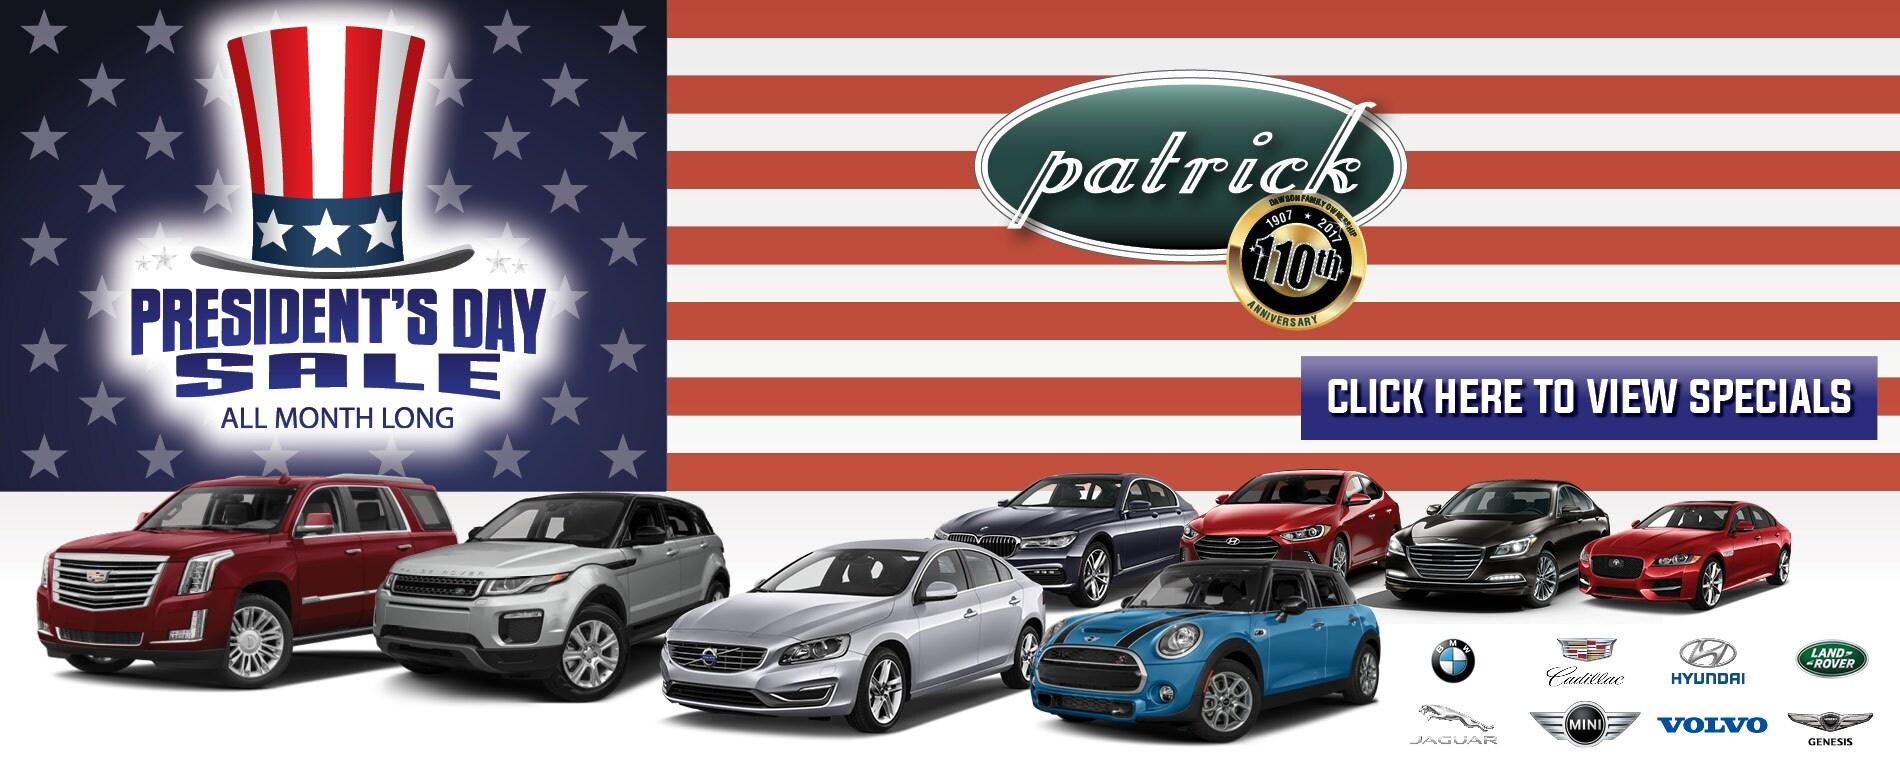 Presidents Day Car Sales 2017 >> Patrick New & Used Car Dealer Chicago IL   Hyundai, BMW ...